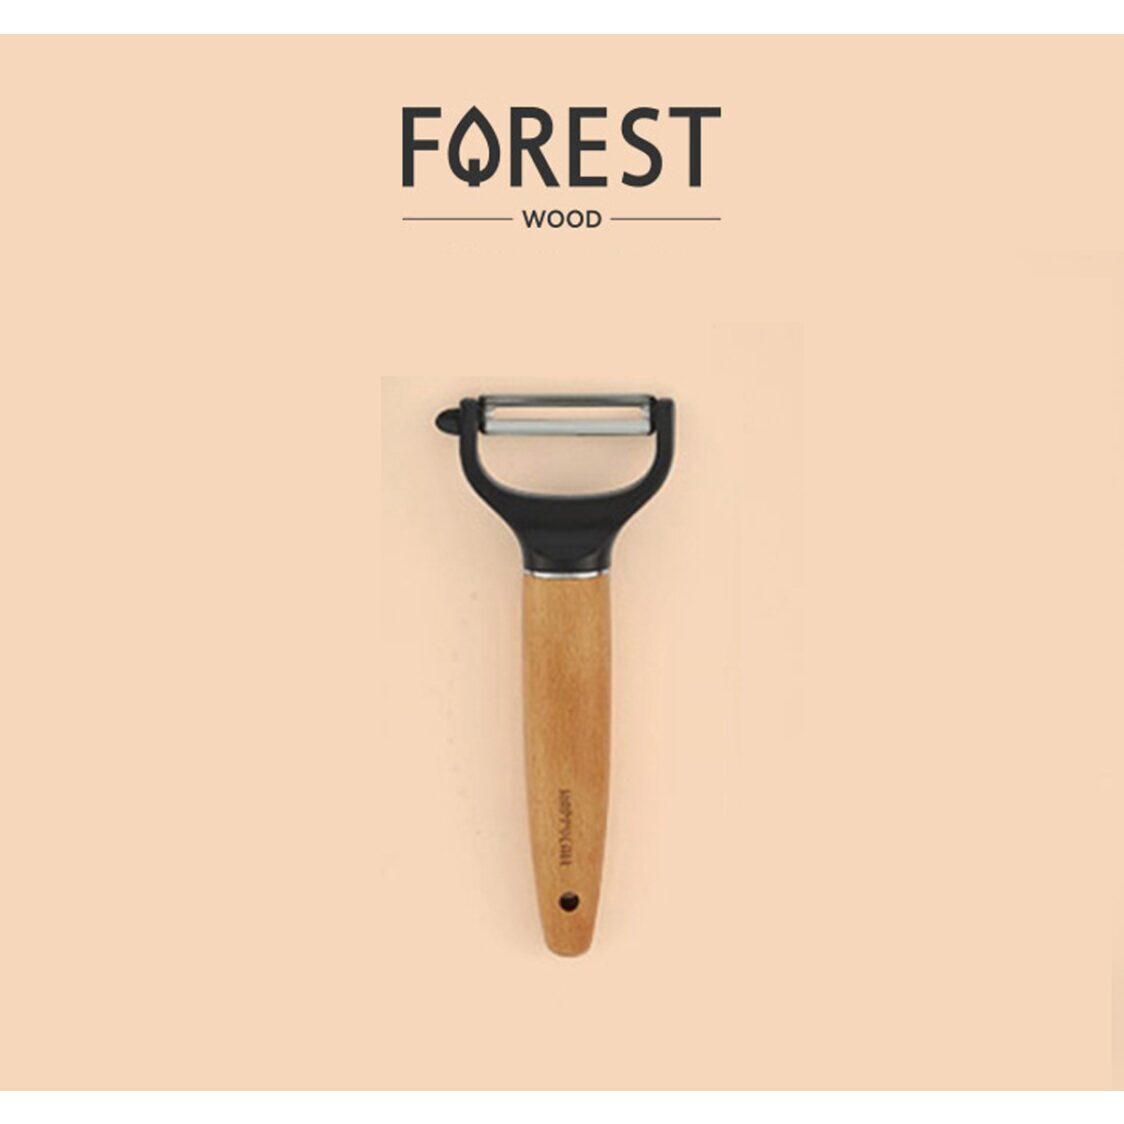 Happycall Forest Wood Peeler 4004-1021